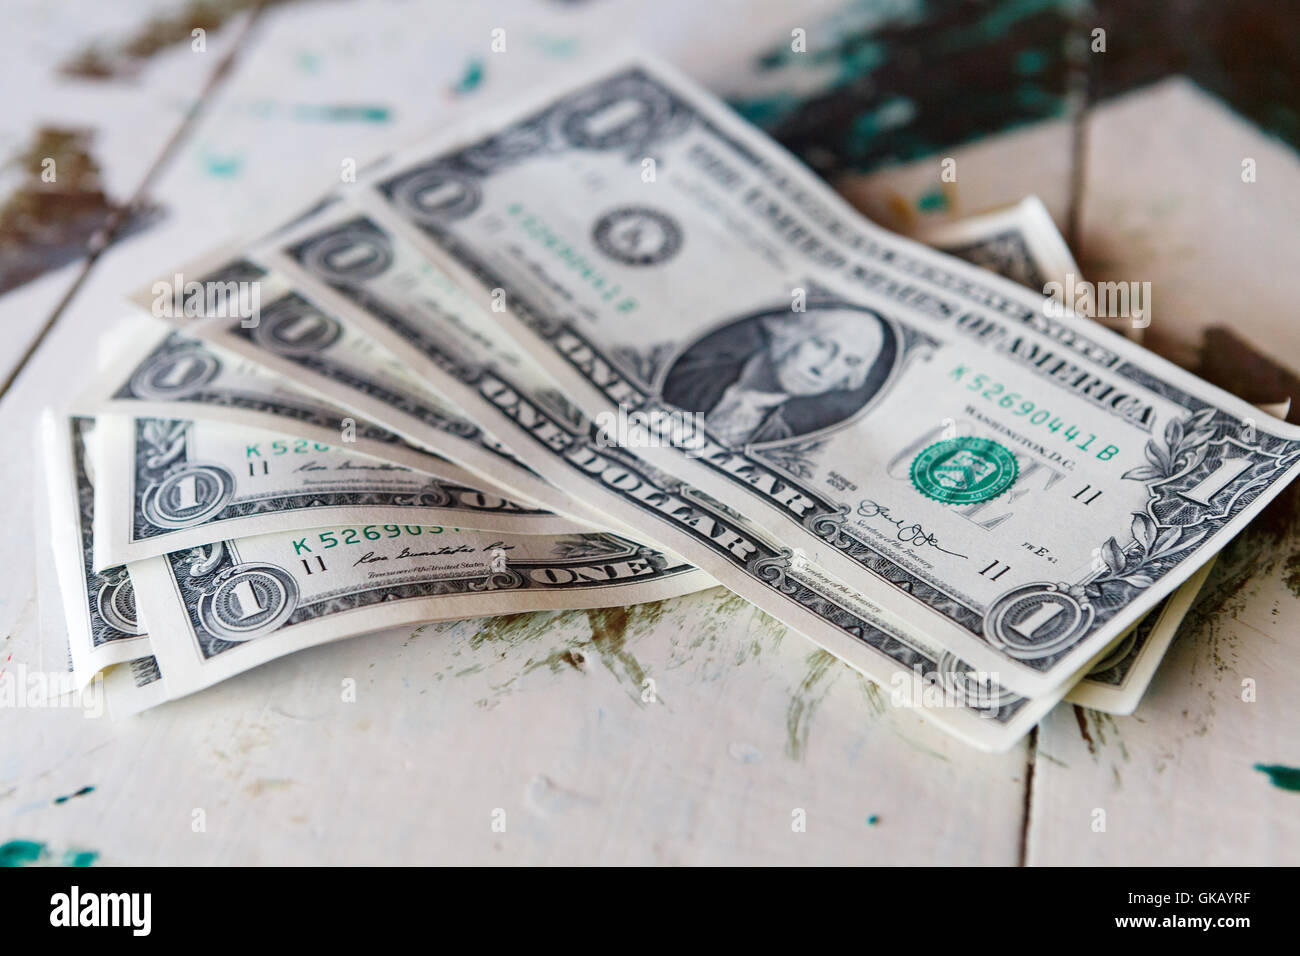 Money - USD one dollar bills on vintage table - Stock Image